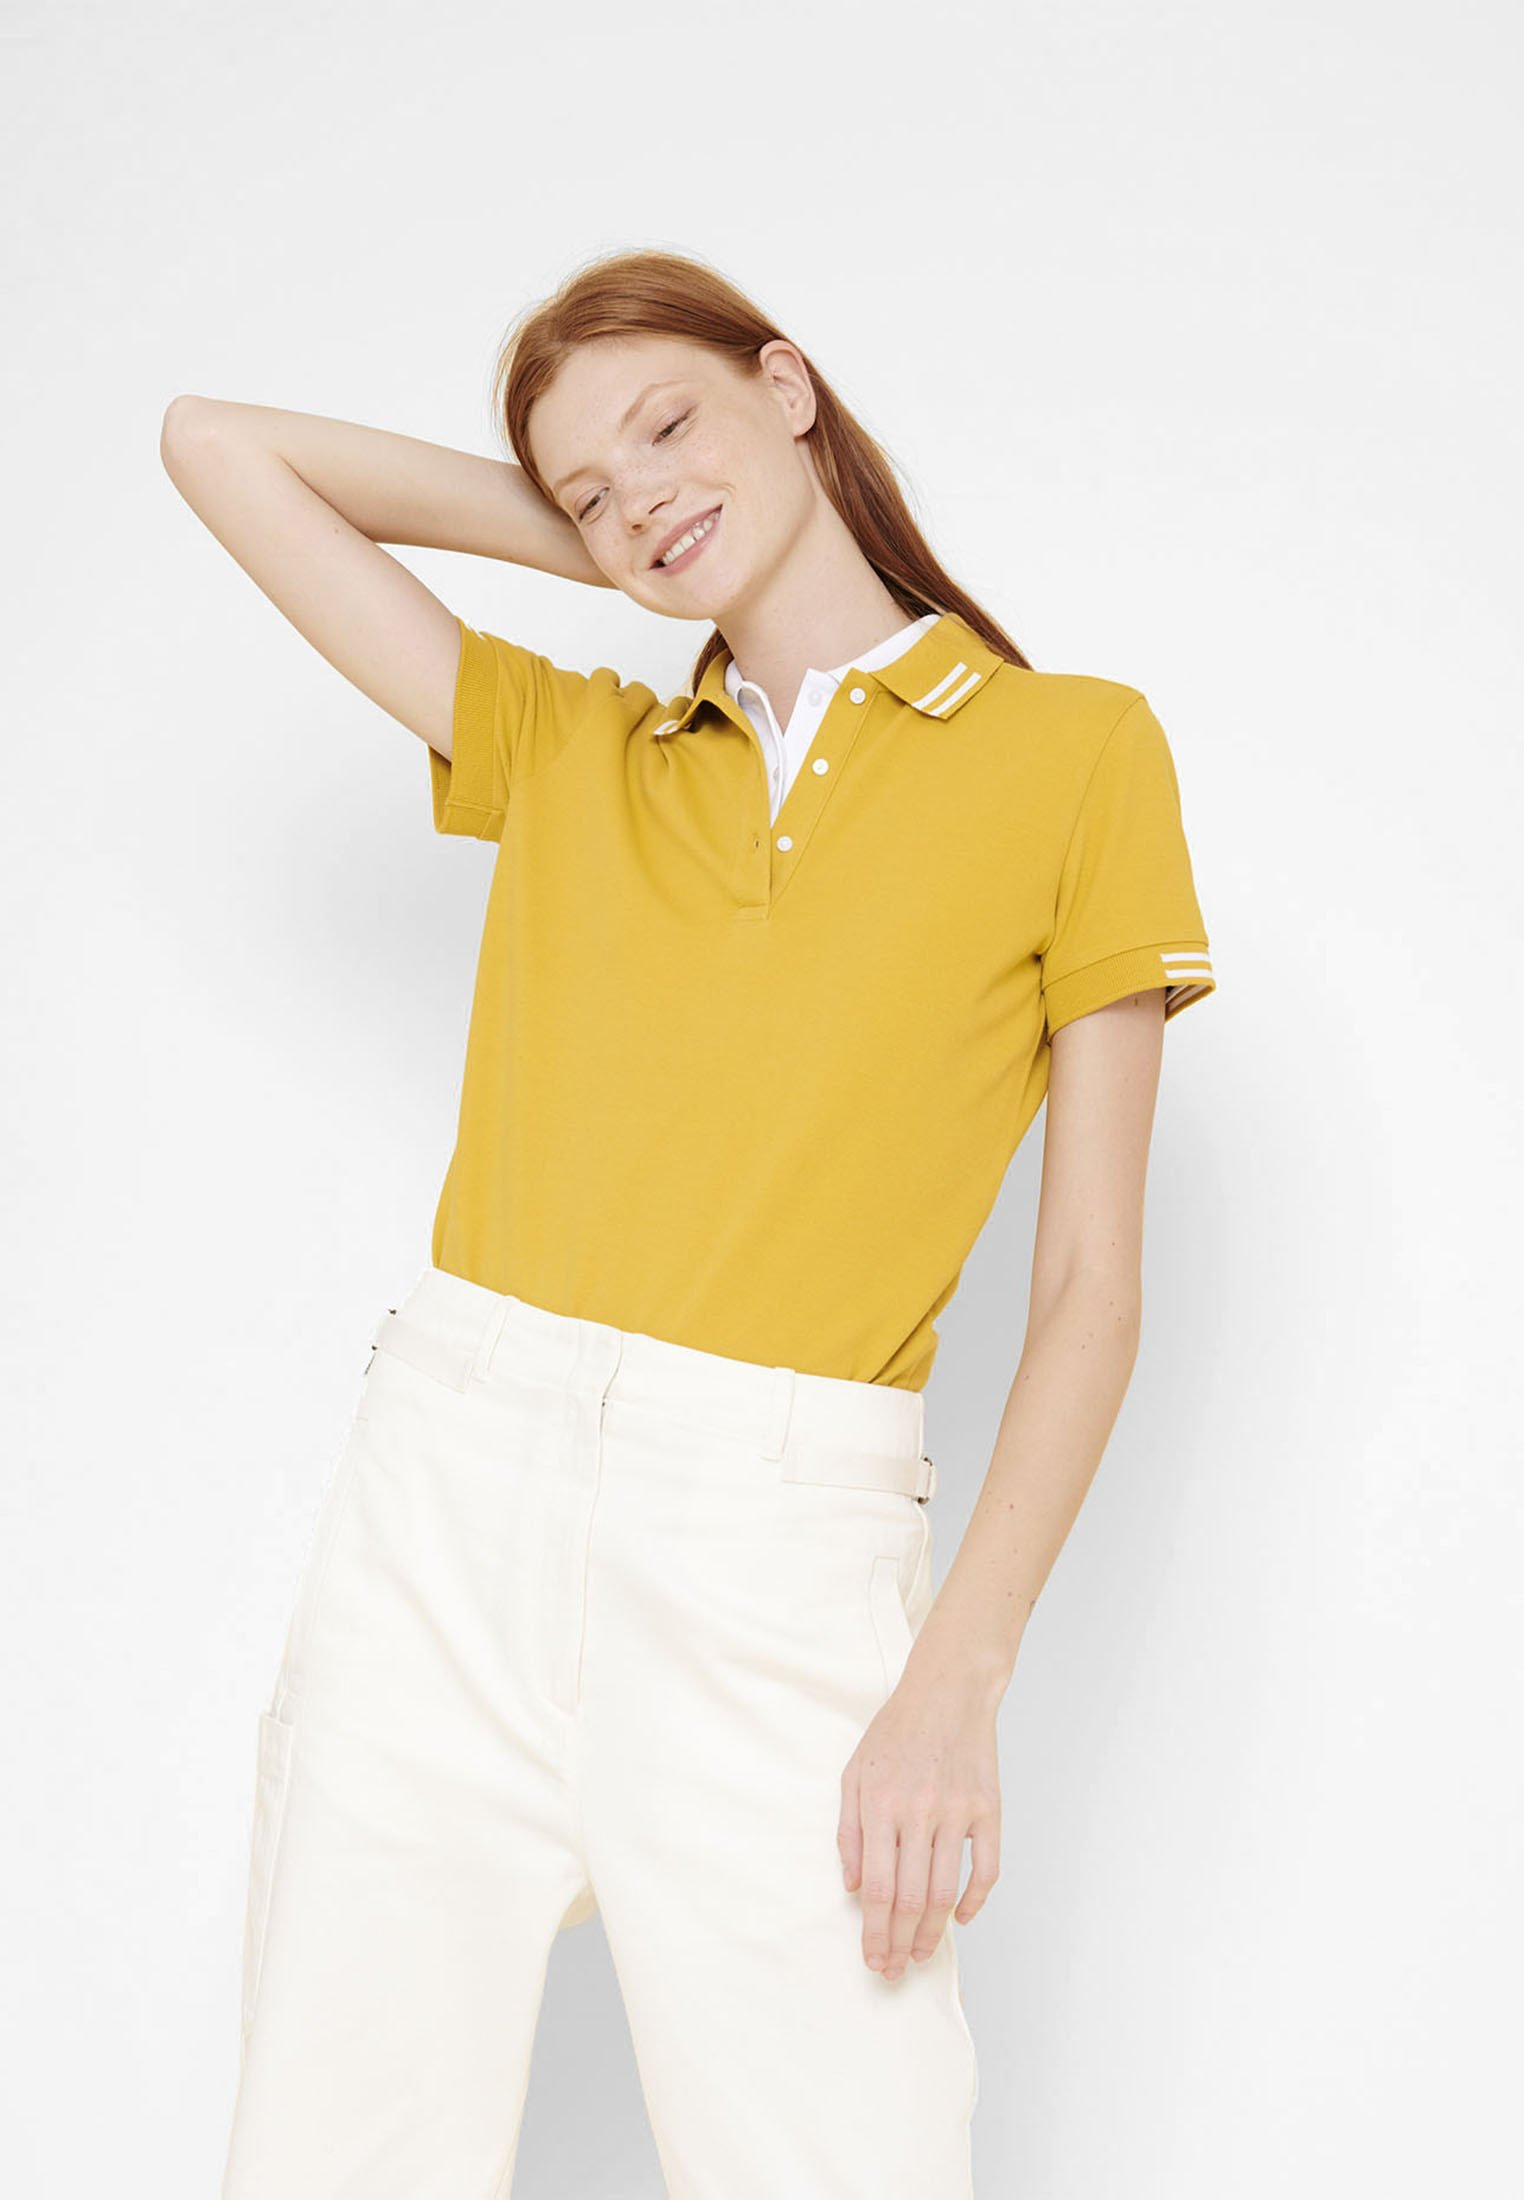 Aigle ROSIPOLO - Polo - yellow - Tops & T-shirts Femme 8N4Q3